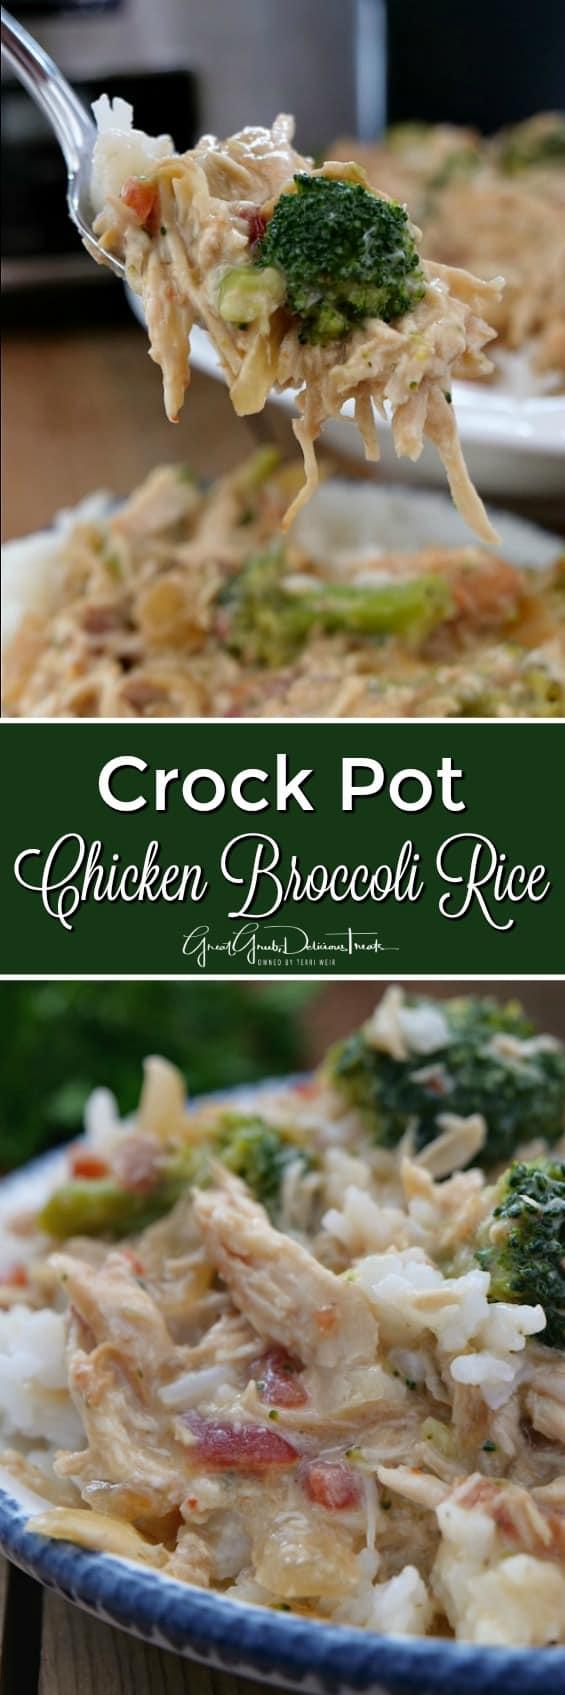 Crock Pot Chicken Broccoli Rice